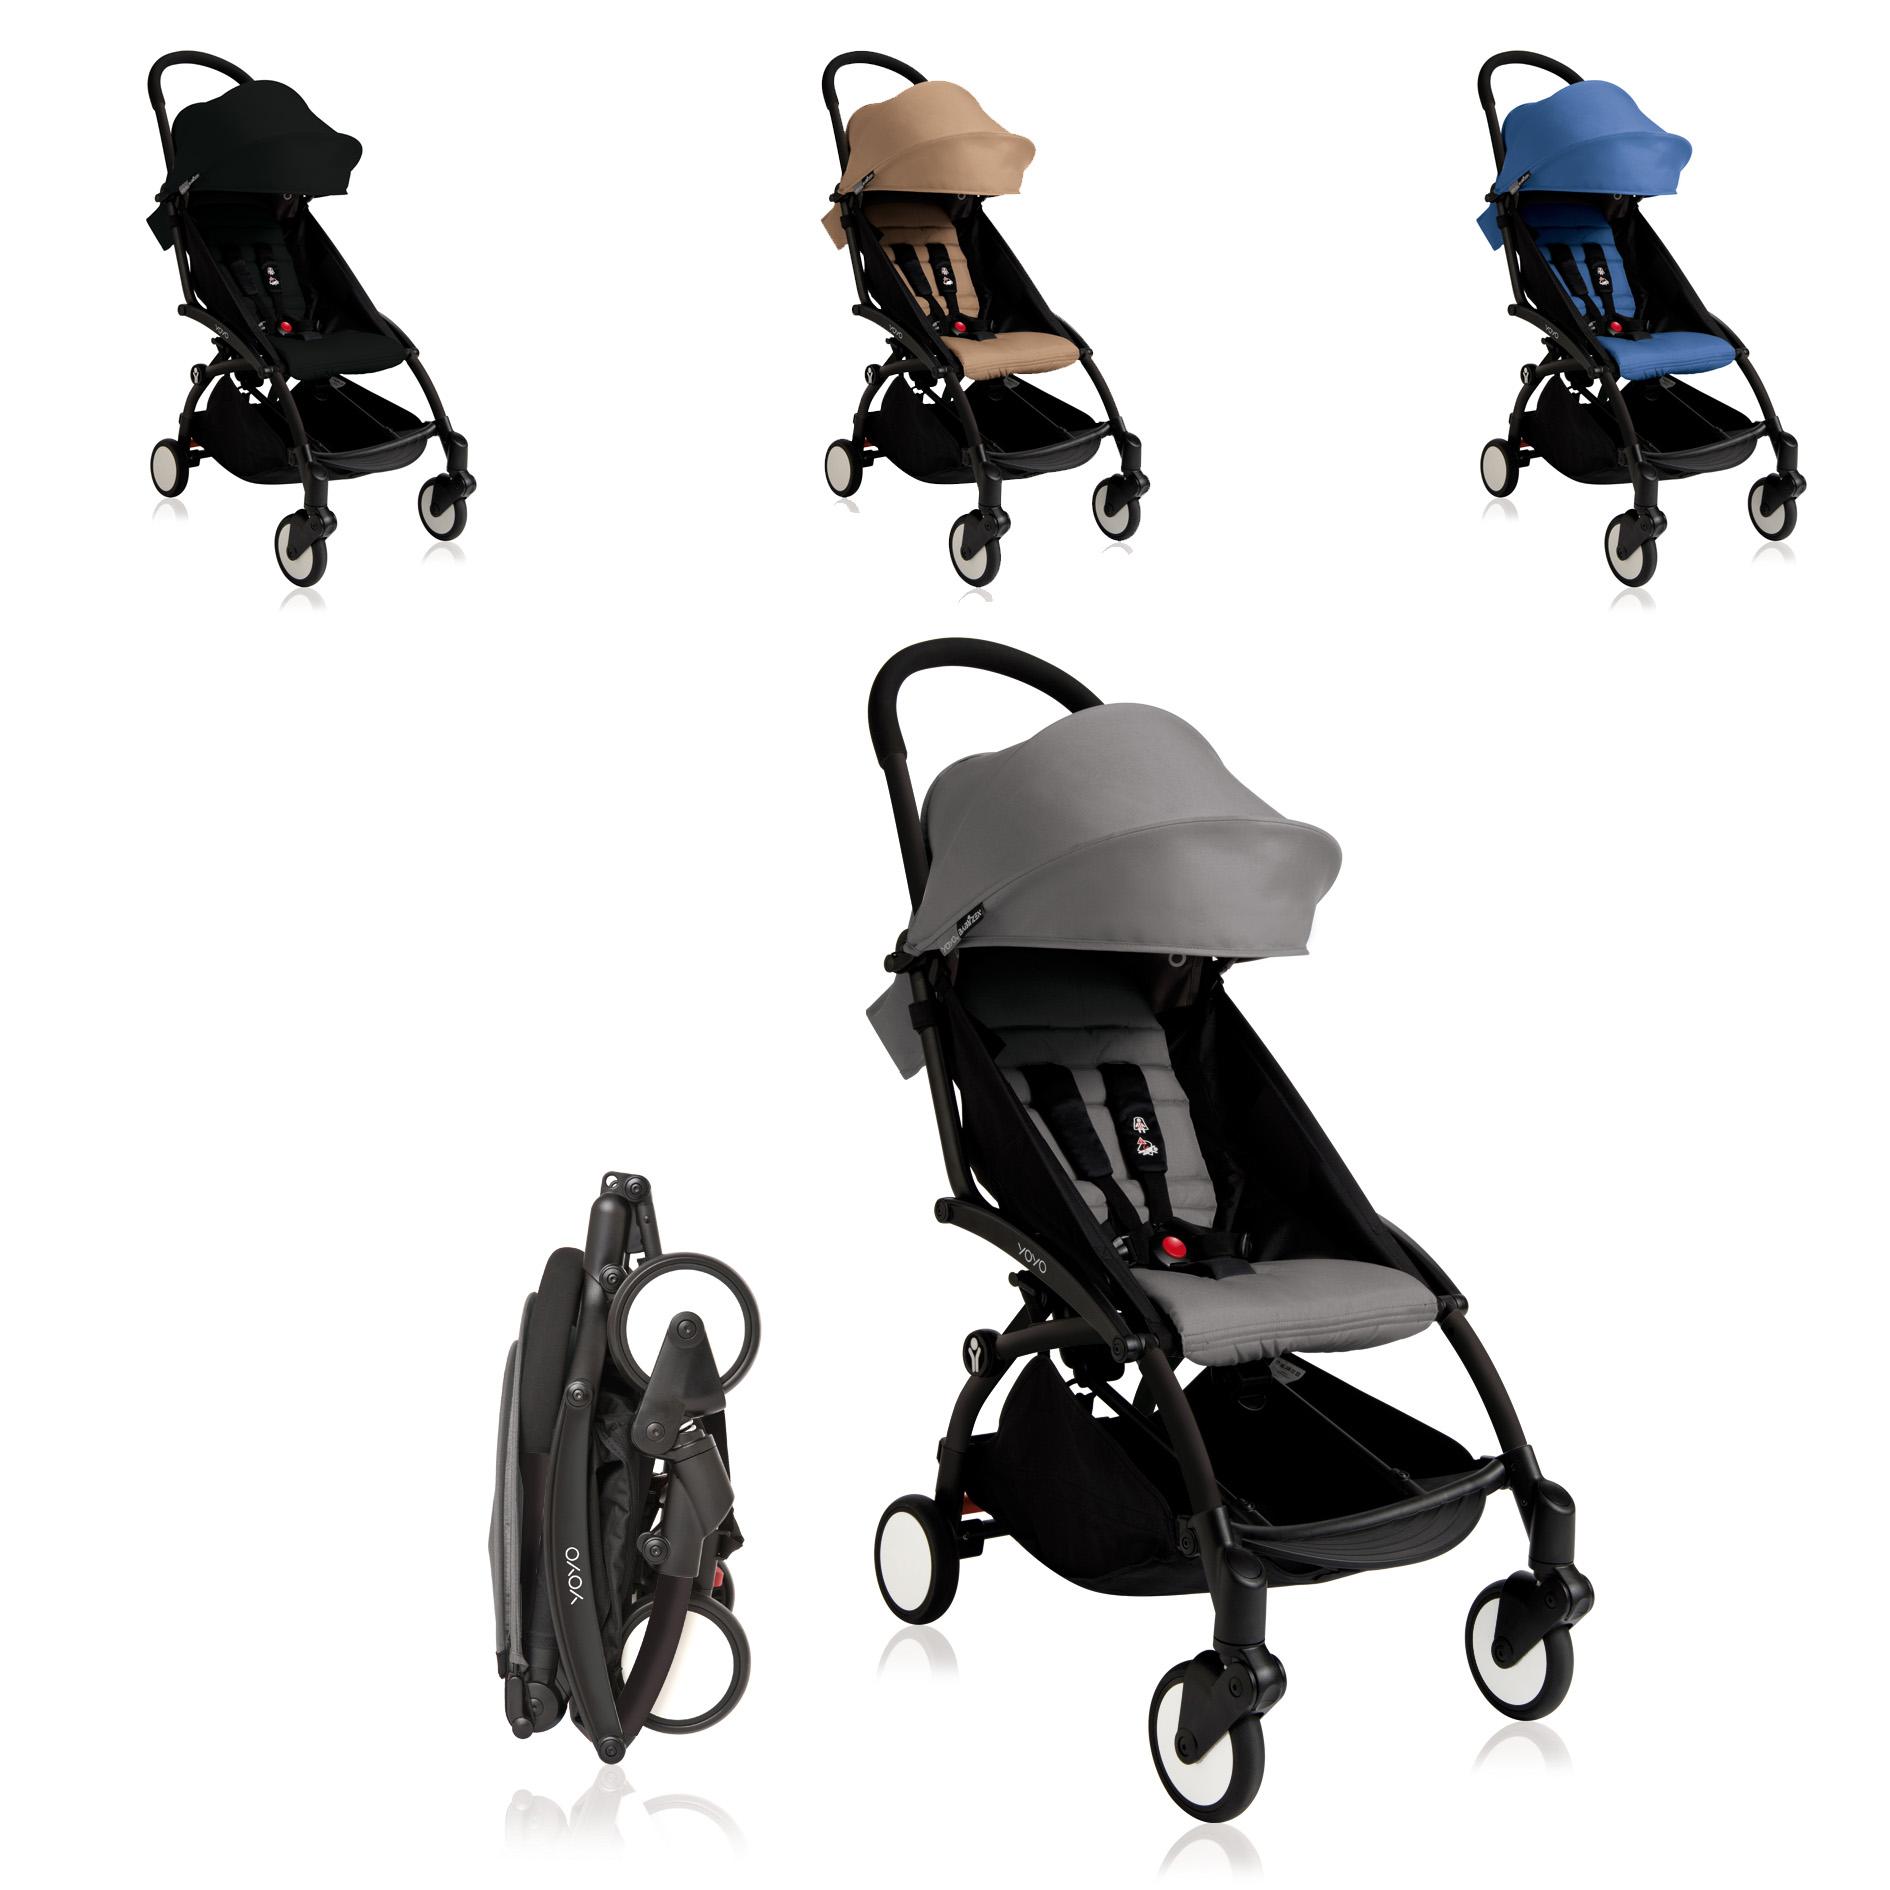 babyzen kinderwagen buggy yoyo 6 ab 6 monate. Black Bedroom Furniture Sets. Home Design Ideas